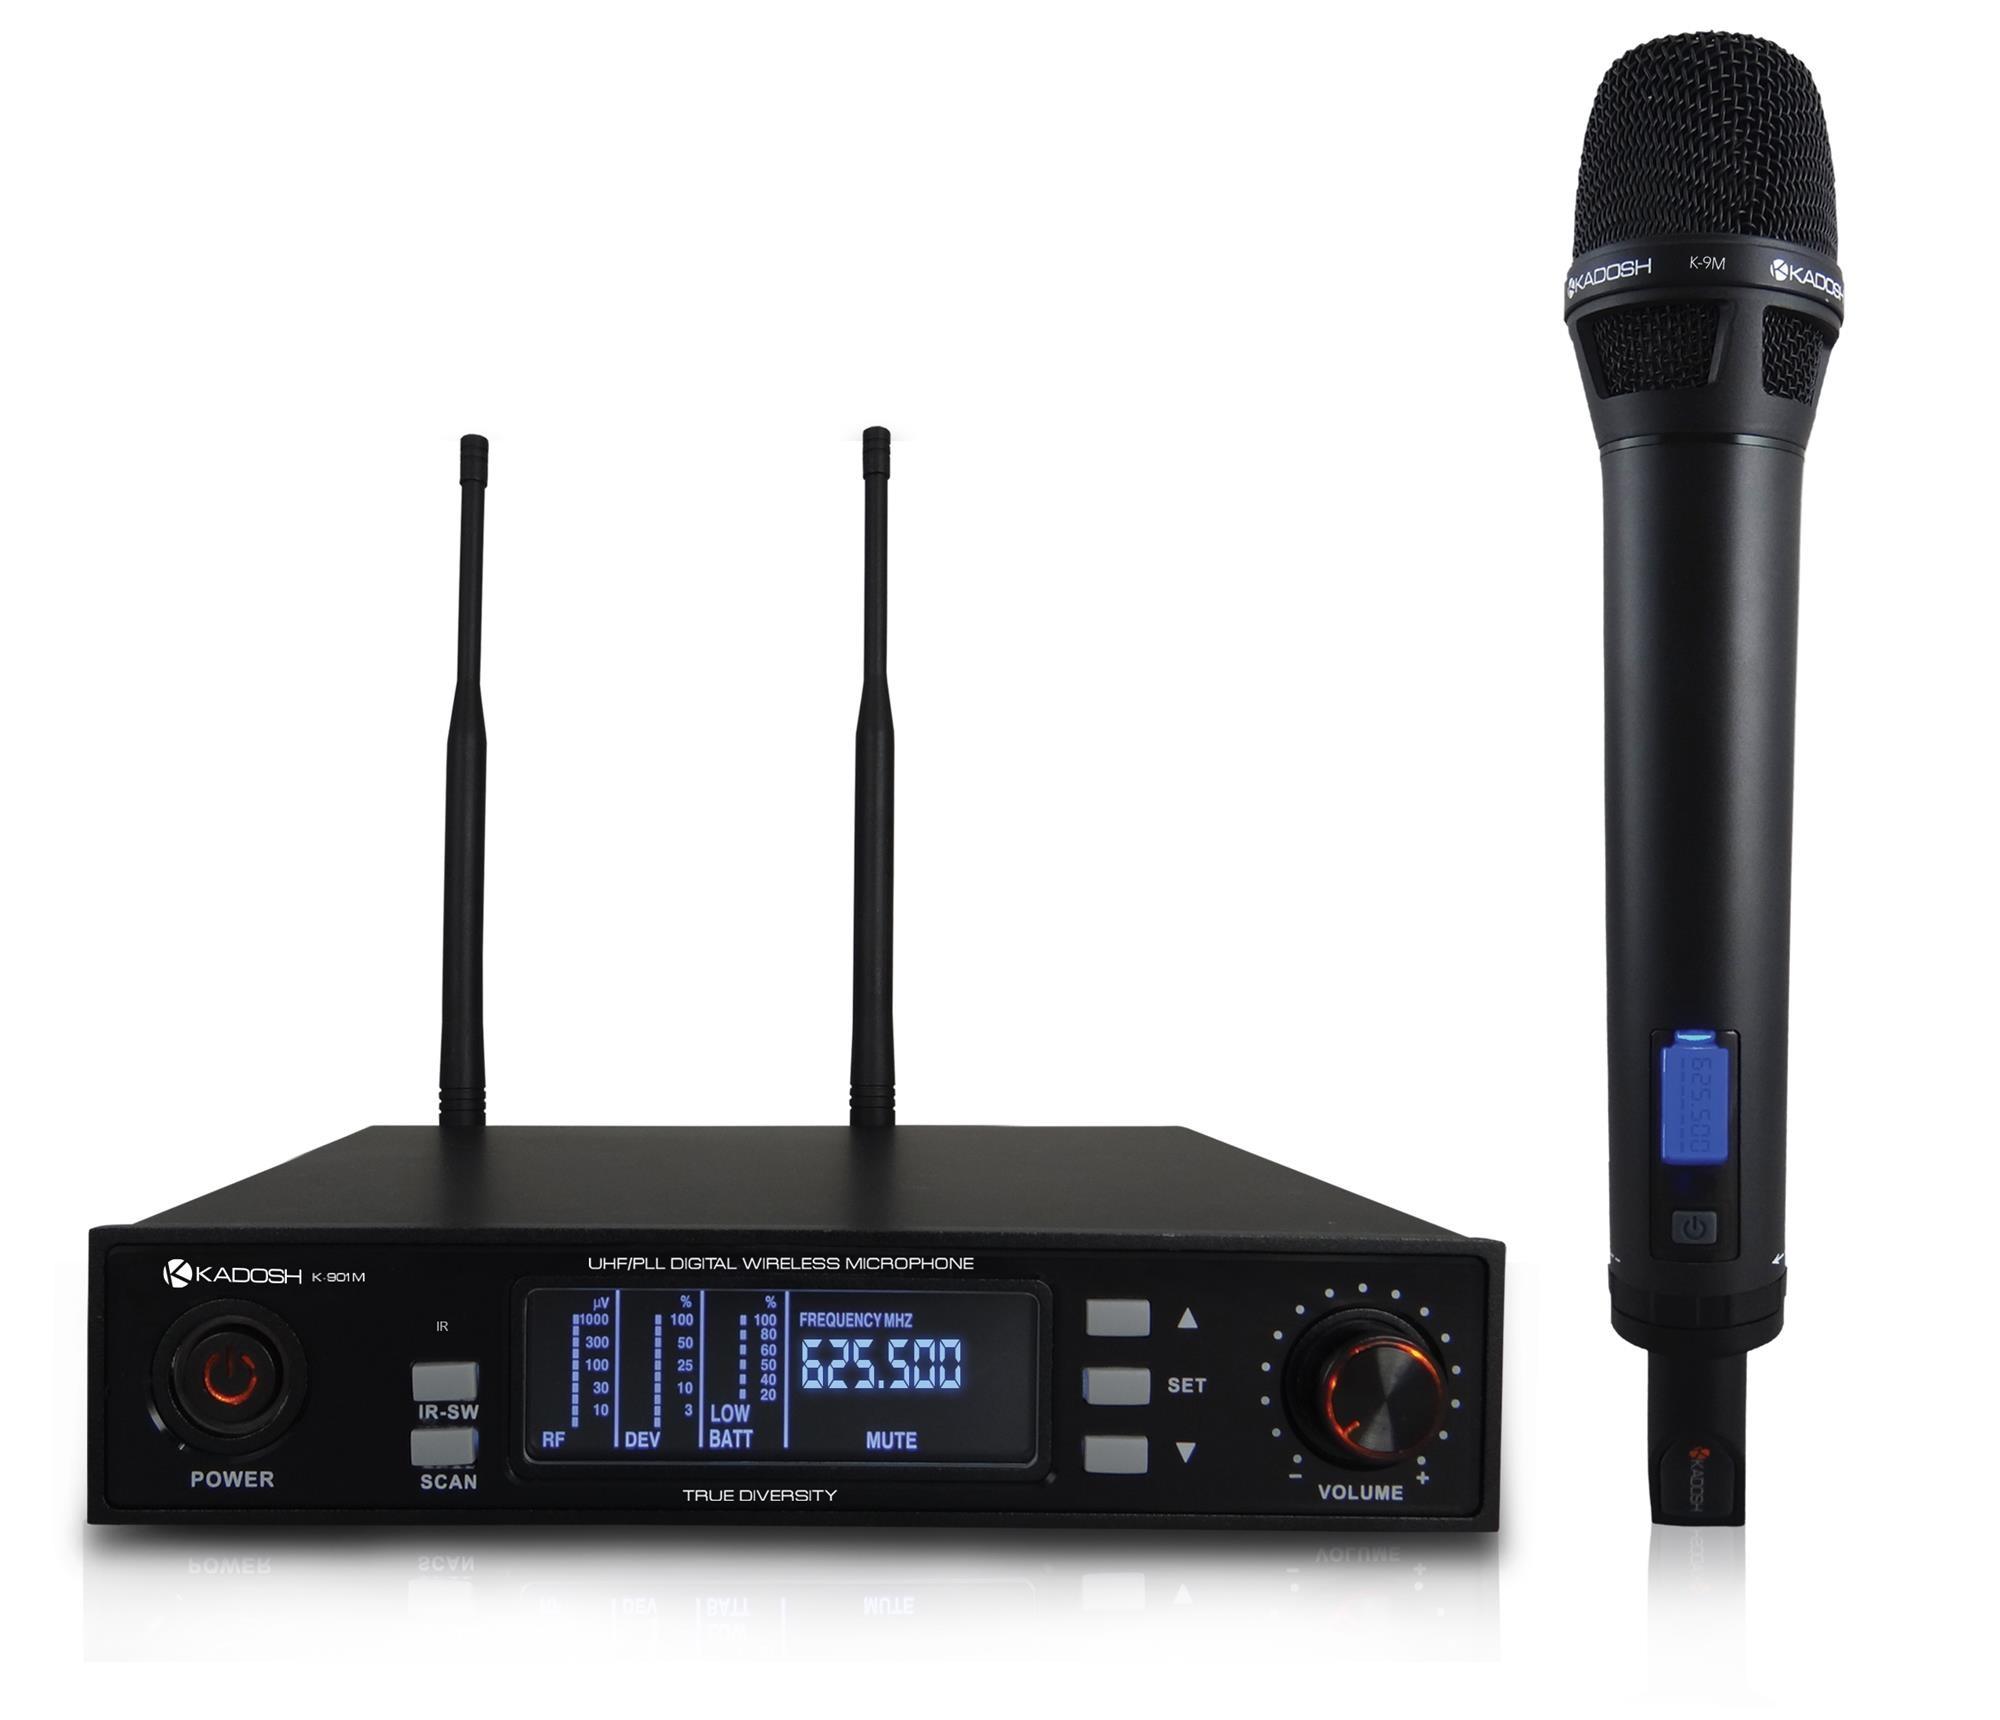 Kadosh Microfone Sem Fio K-901M (UHF/Display Digital)